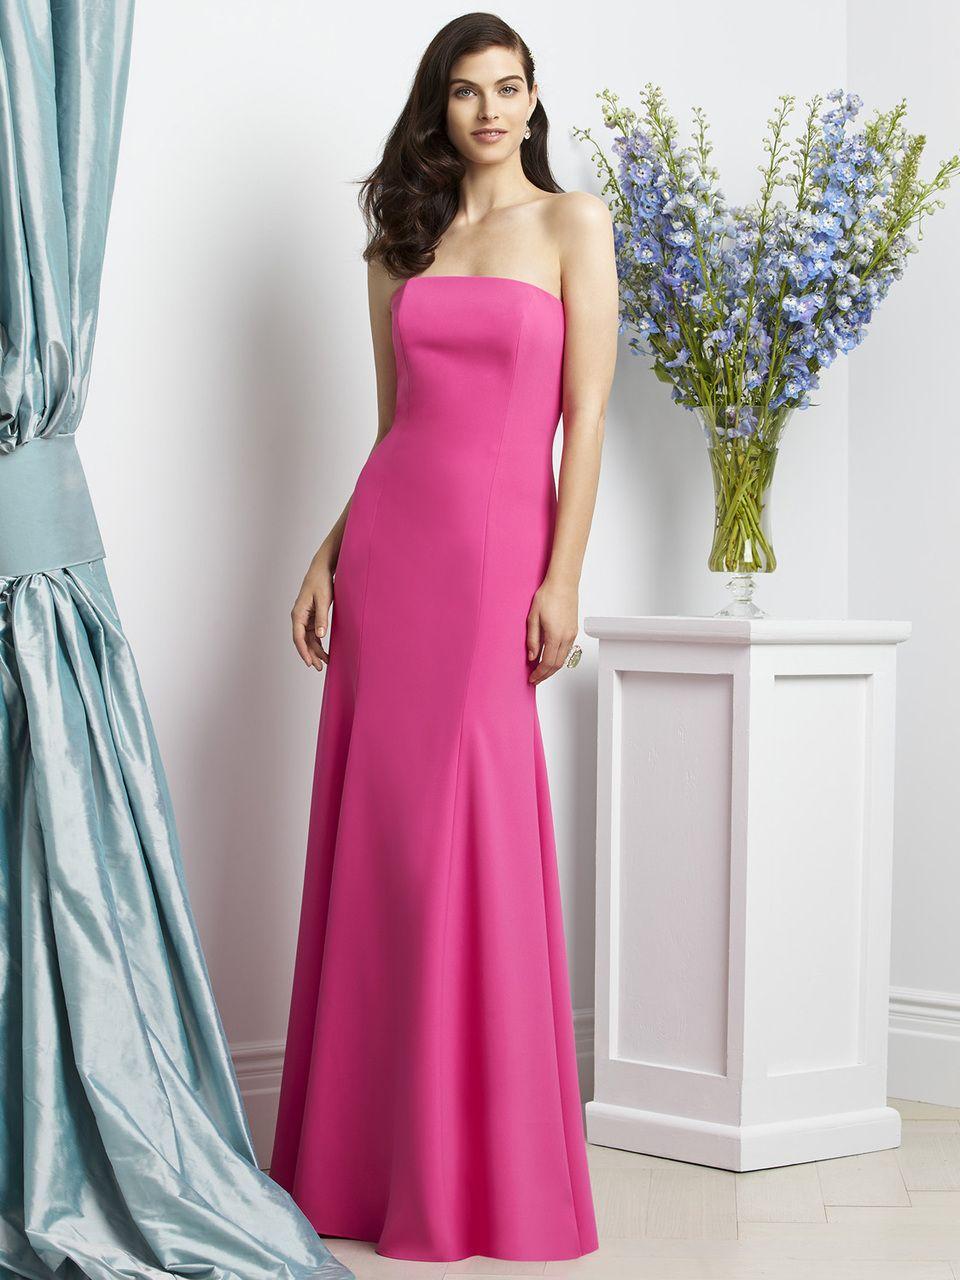 Excelente Vestidos De Novia Tunbridge Wells Festooning - Ideas de ...